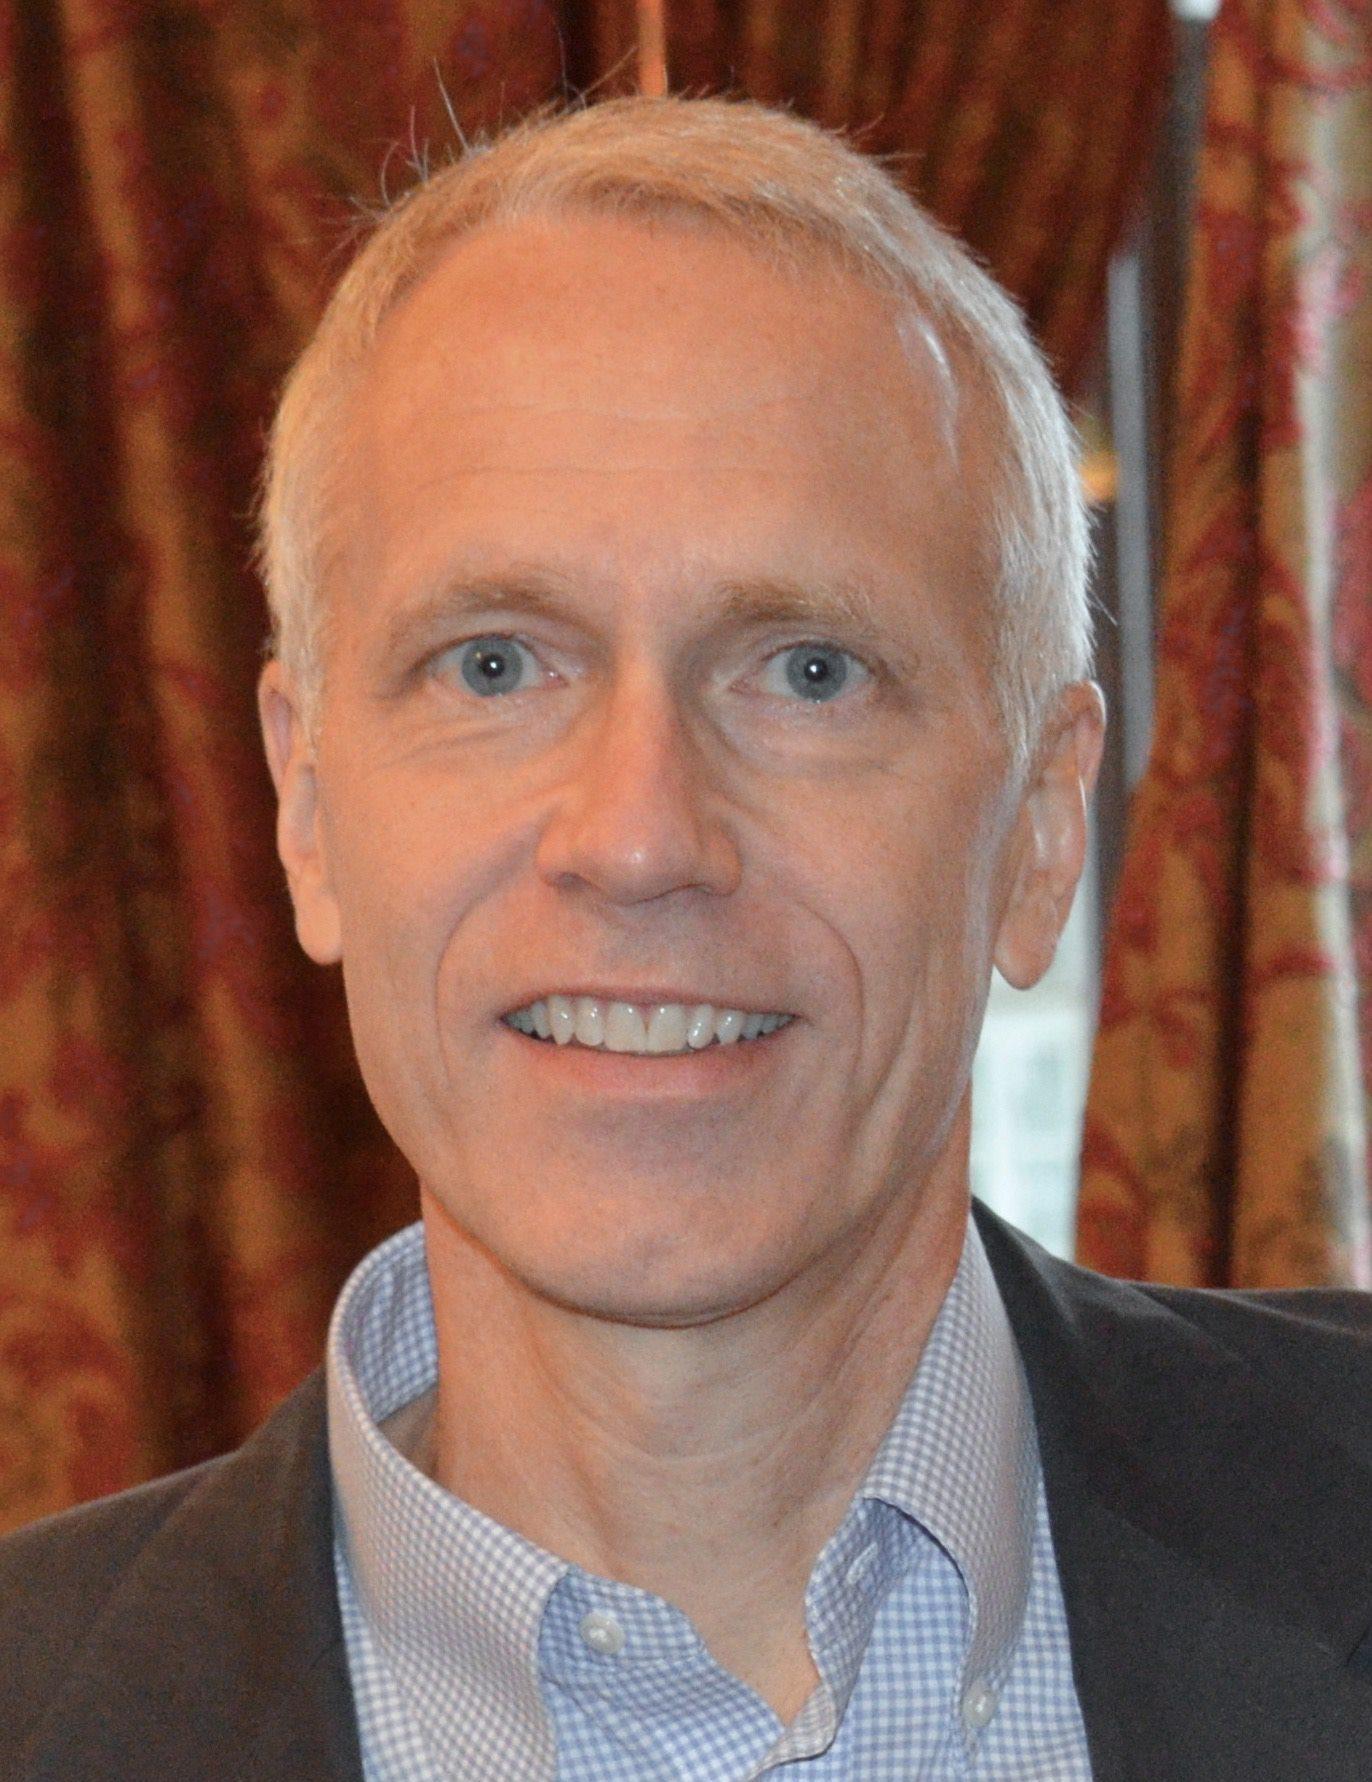 Alumni Profile: Dr. Brian Kobilka (MD '81)